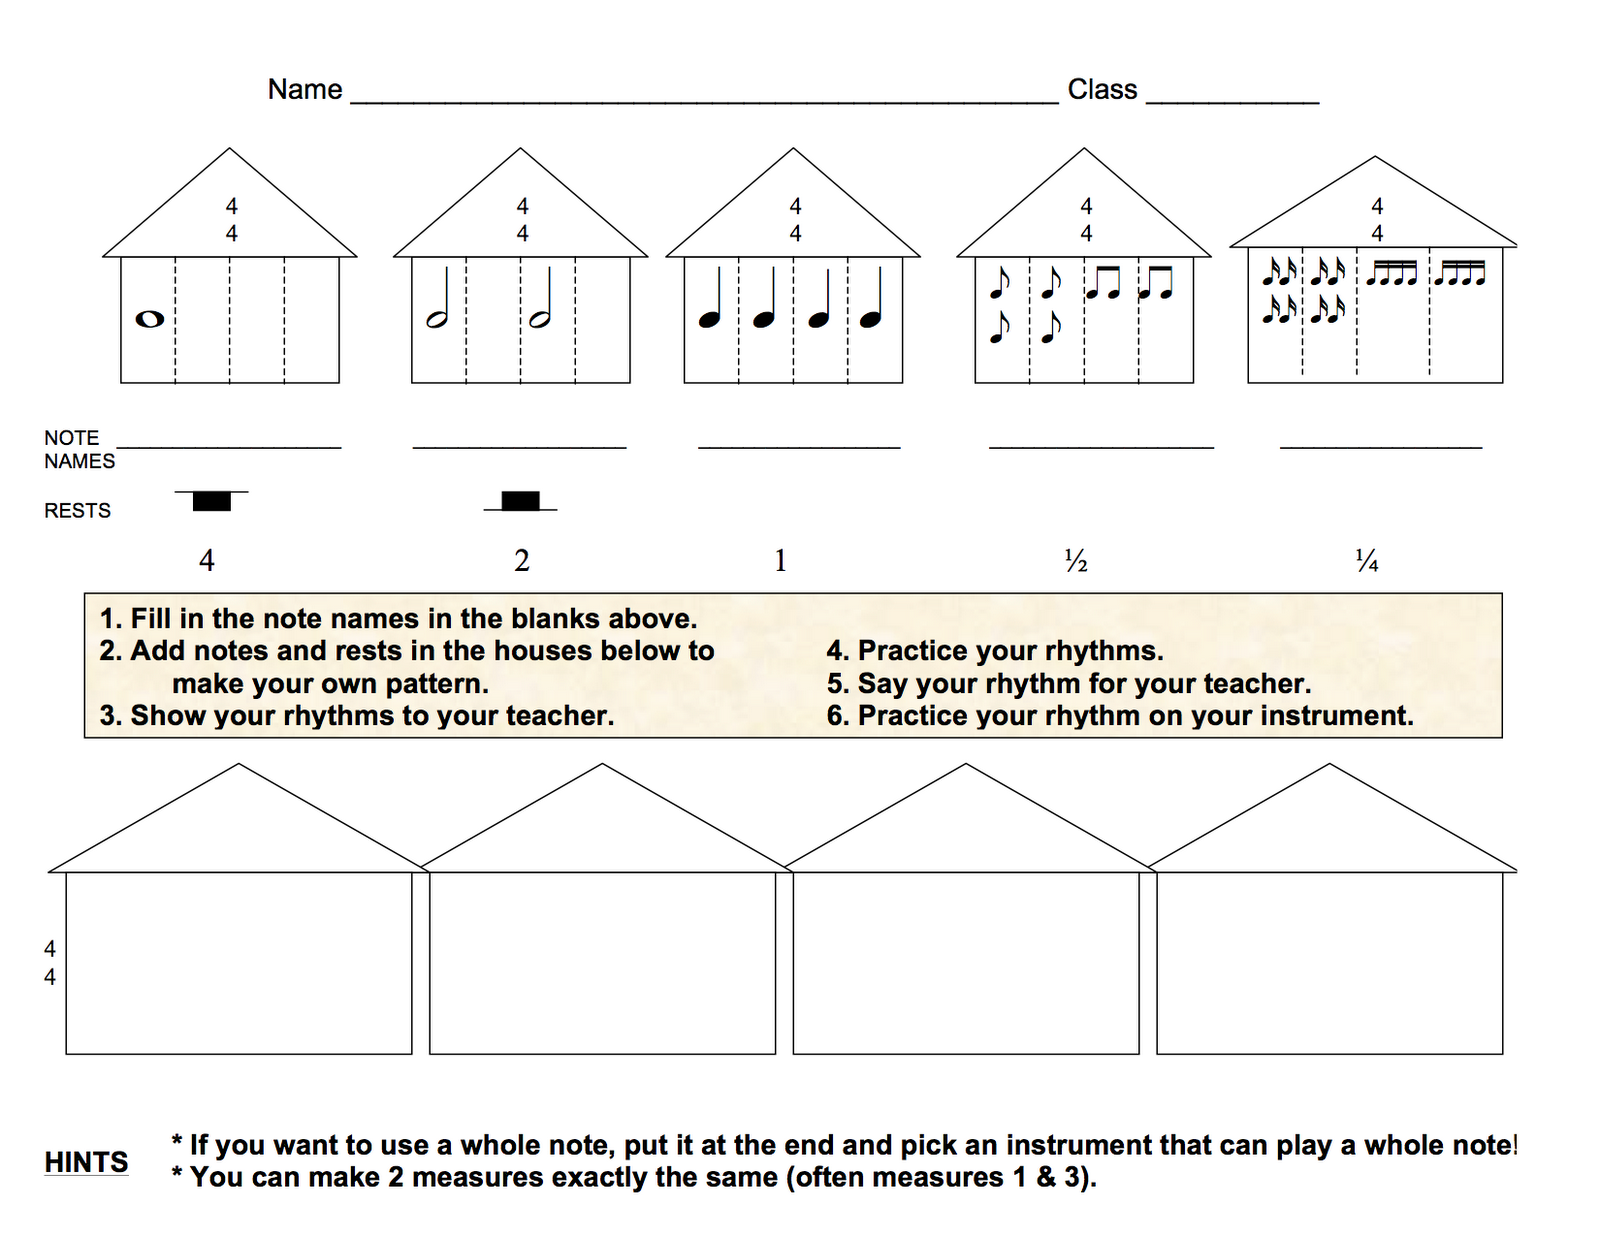 4th Grade Rhythm Assessments